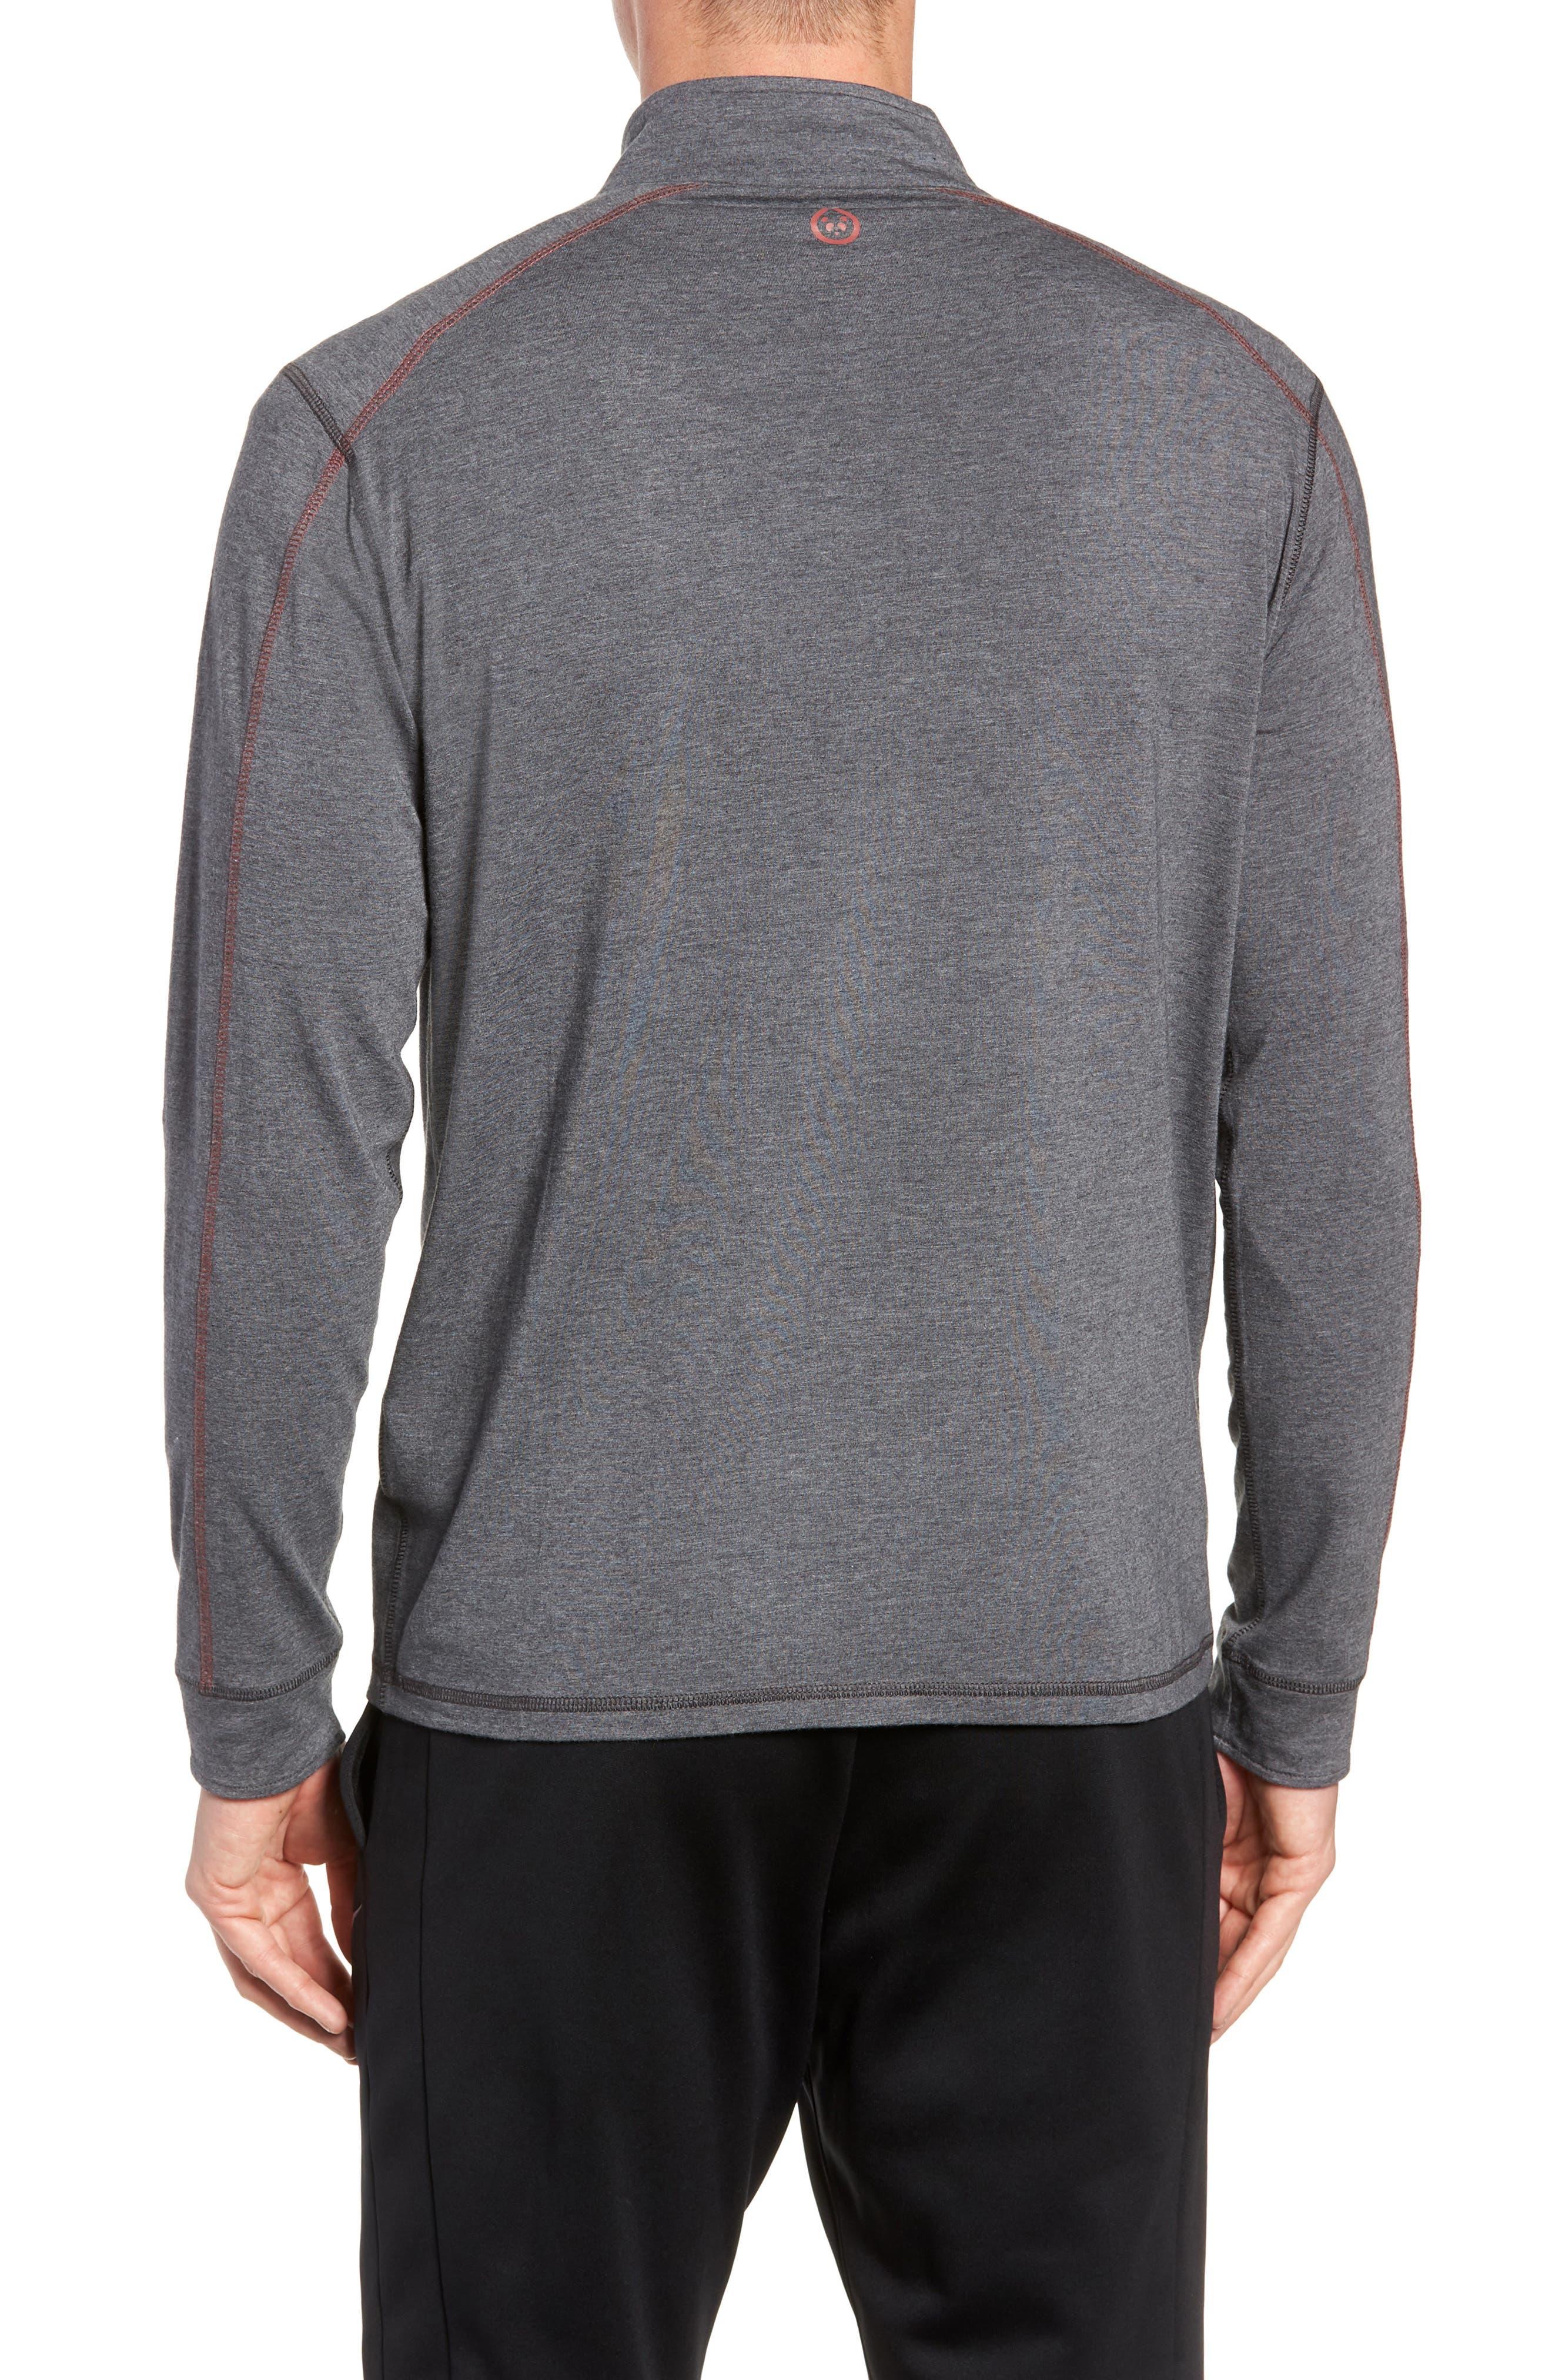 TASC PERFORMANCE, Carrollton Quarter Zip Sweatshirt, Alternate thumbnail 2, color, BLACK HEATHER/ MERCURY